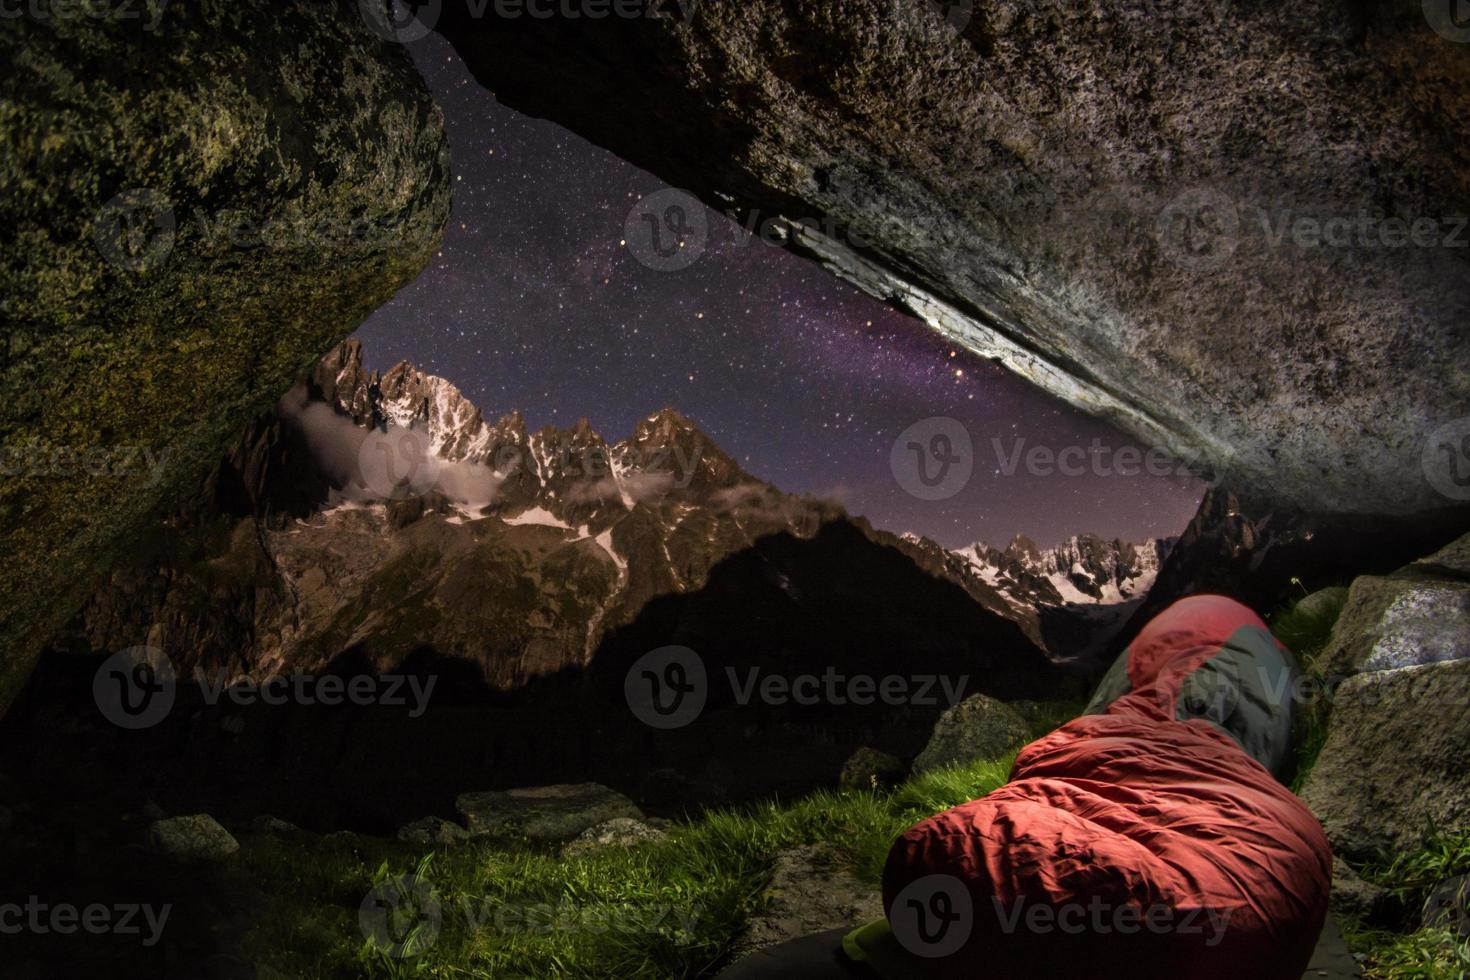 Alpine bivuac, sleeping bag with Charpua Glaciar bassin photo